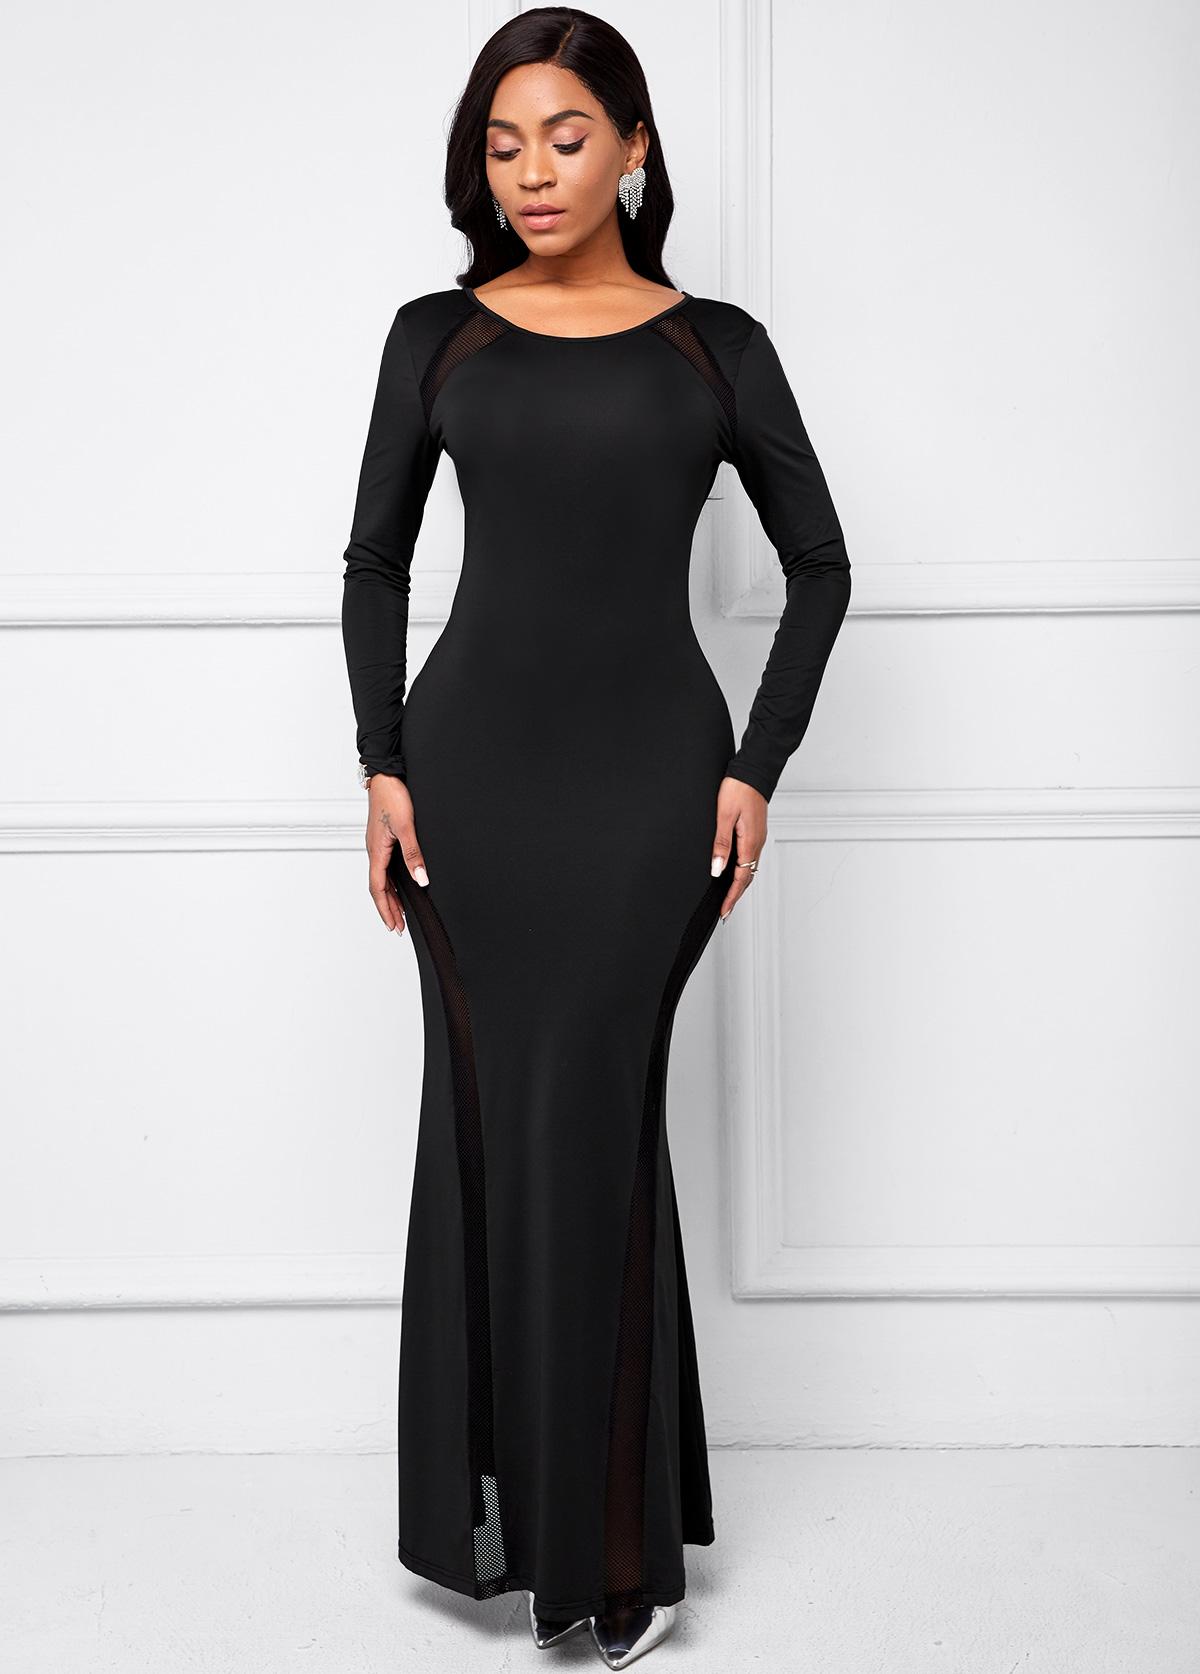 Black Long Sleeve Mesh Stitching Dress